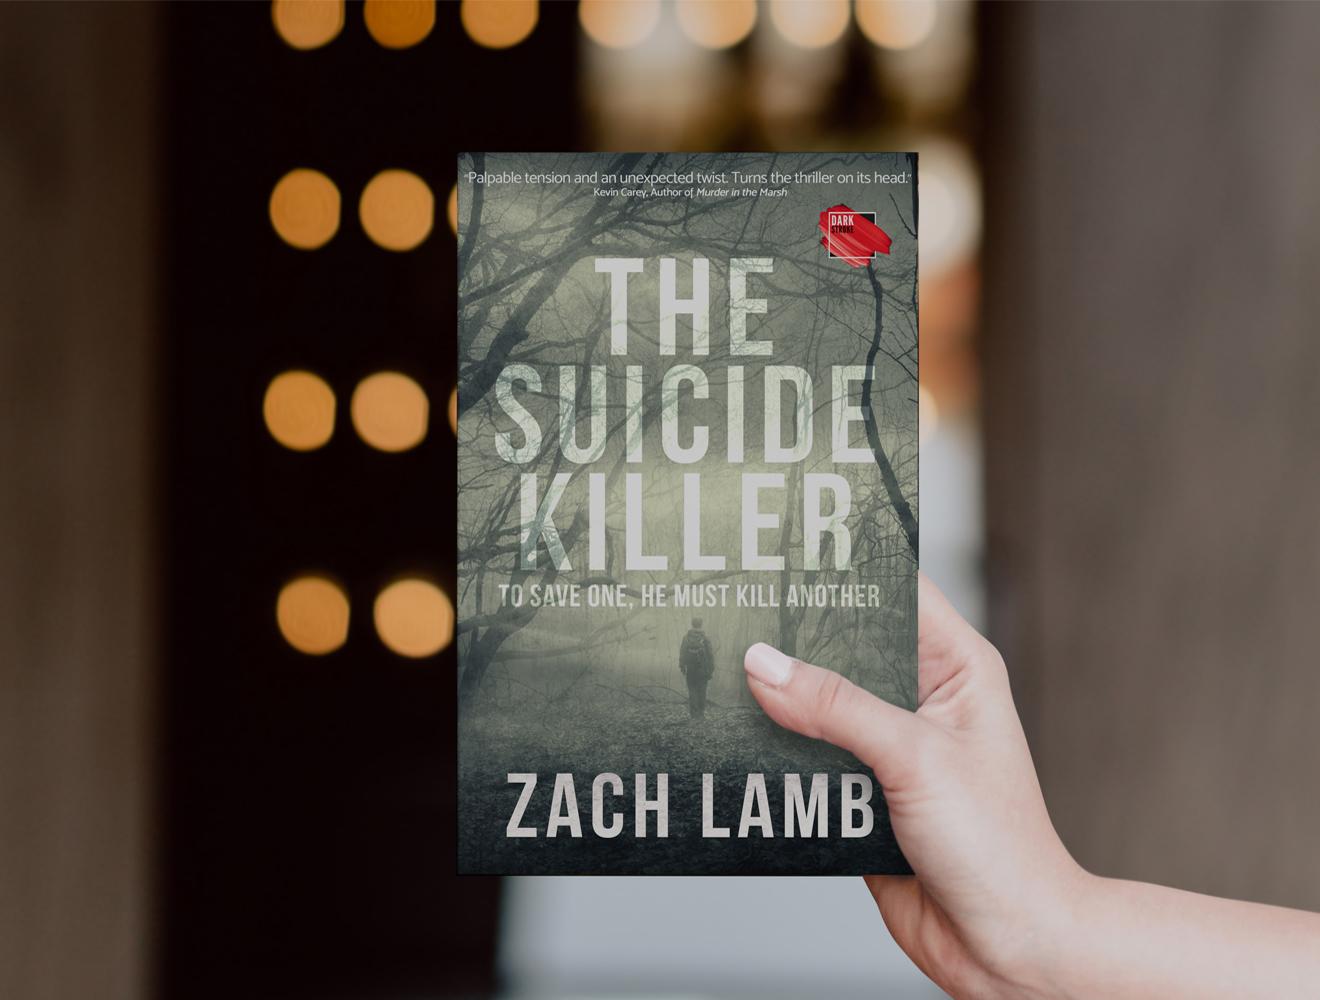 The Suicide Killer